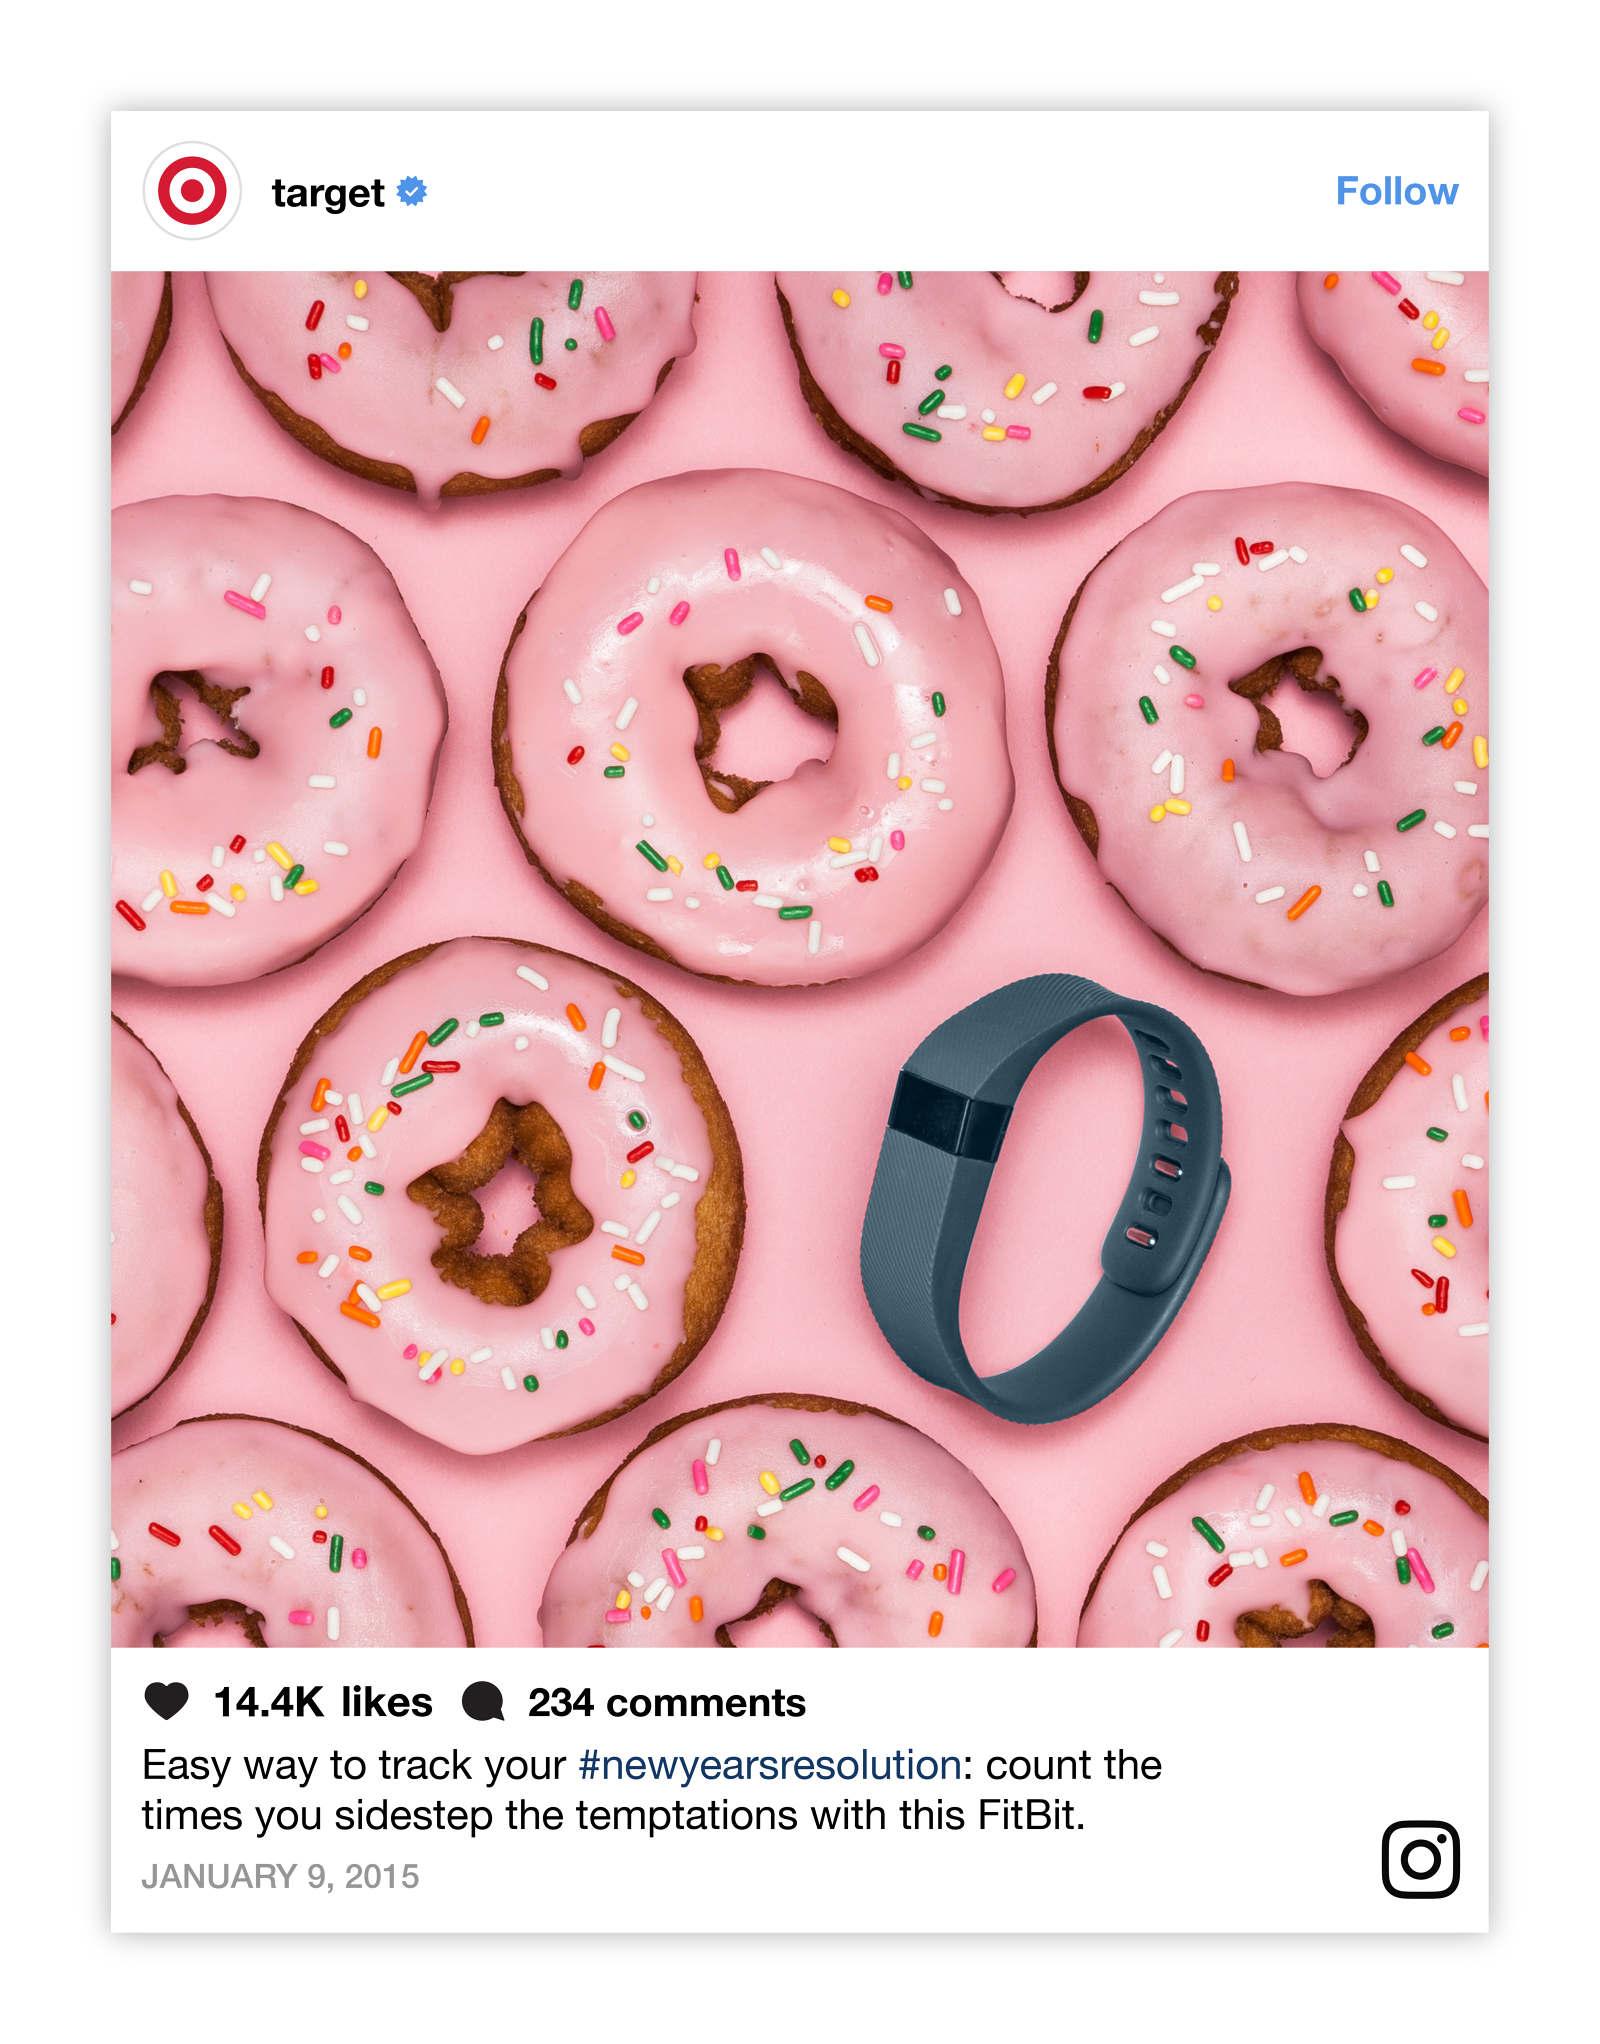 Target Social Media , Gilly Creative \u2022 Scott Gilson \u2022 Gilly